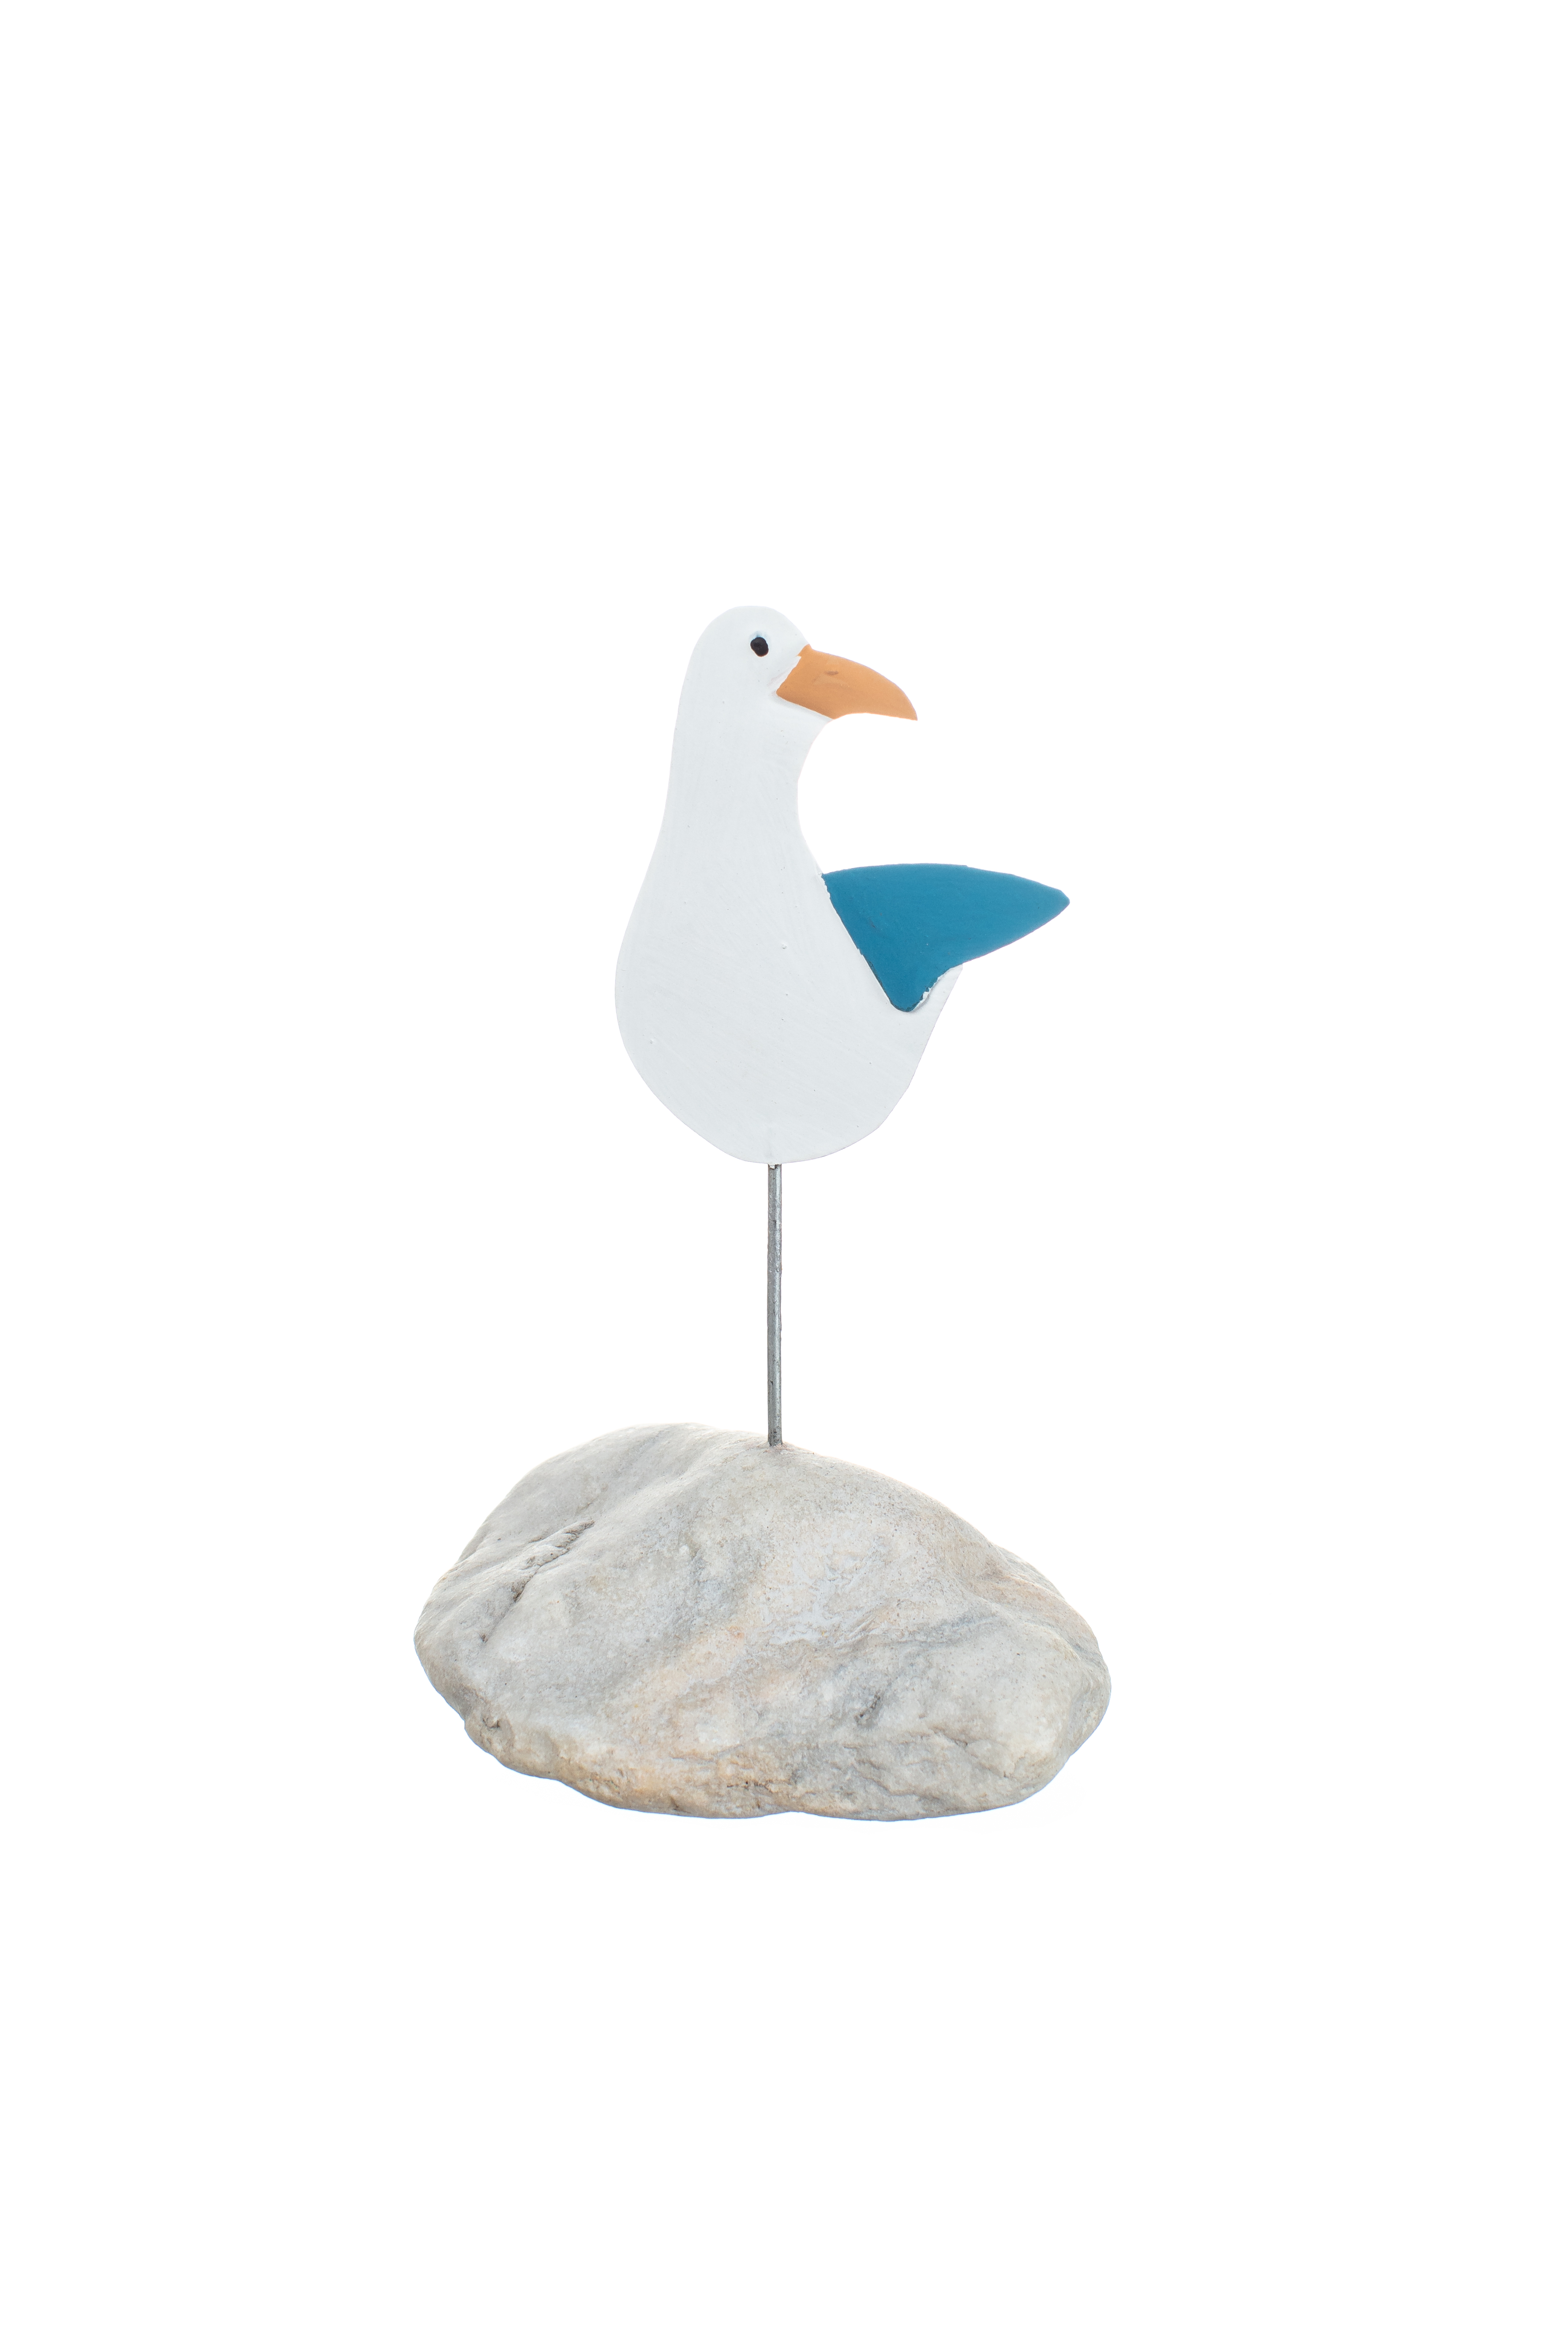 Sam the Seagull on a Pebble